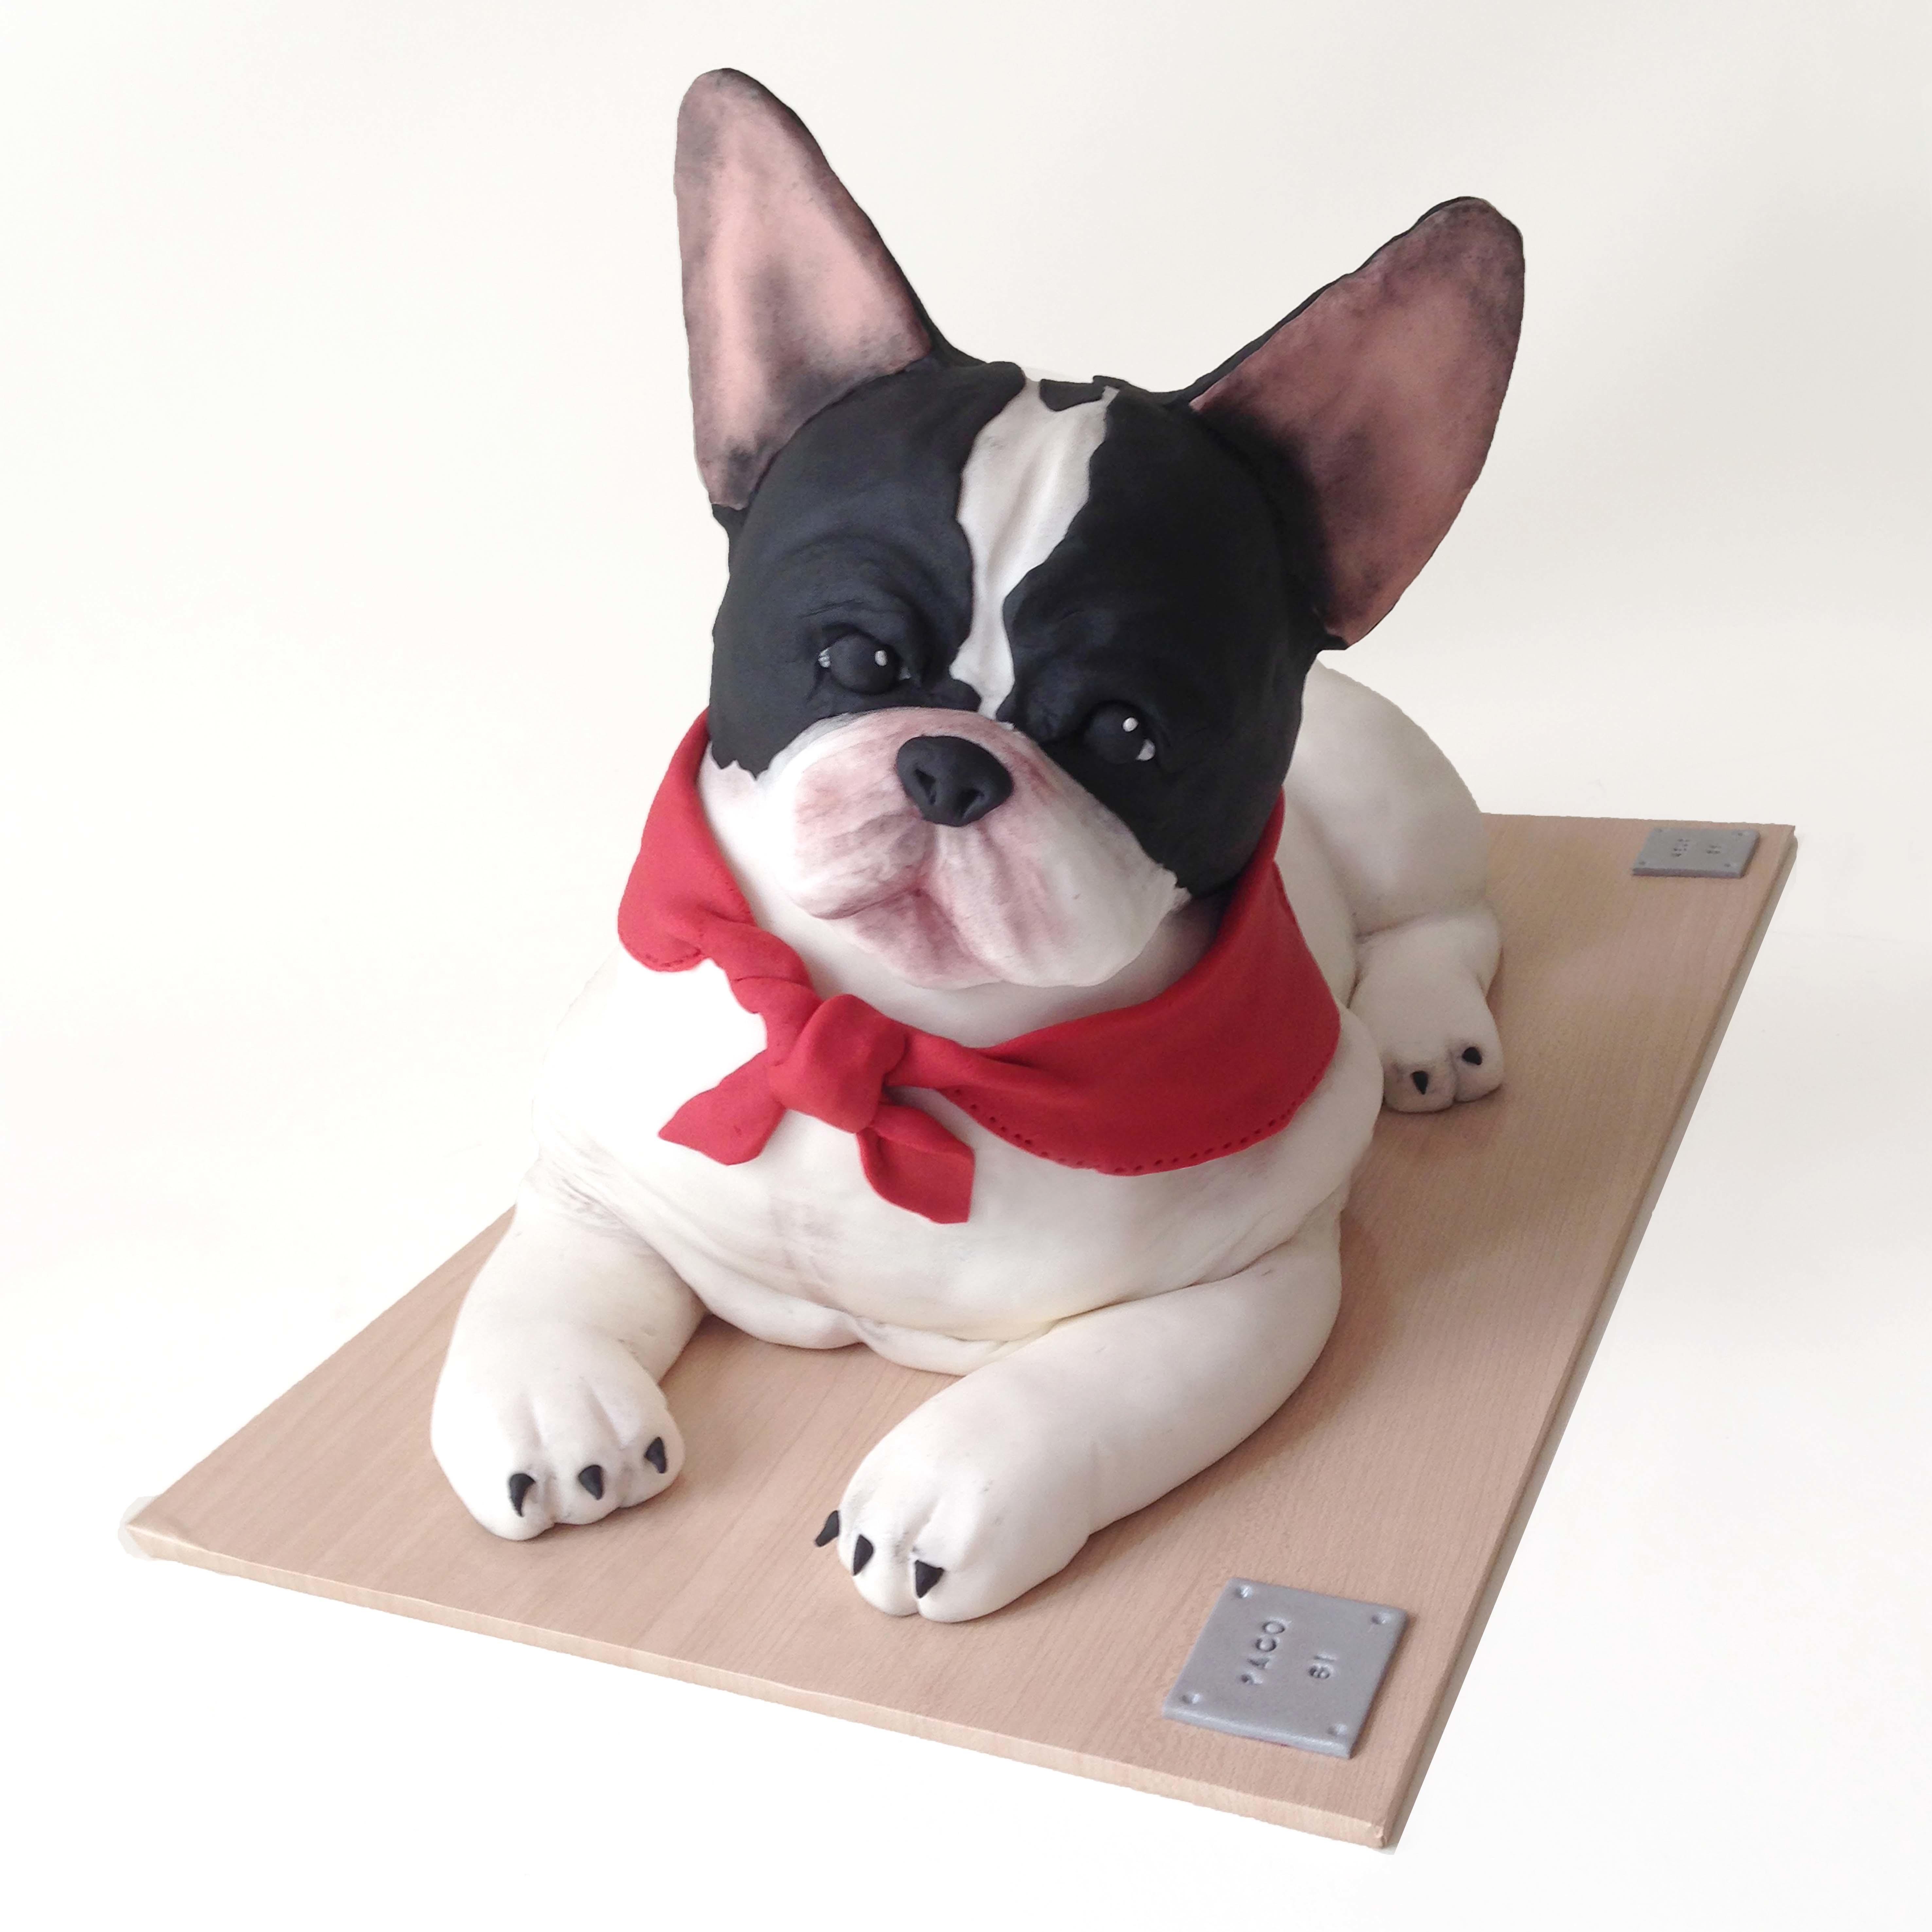 Sculpted Pug Dog